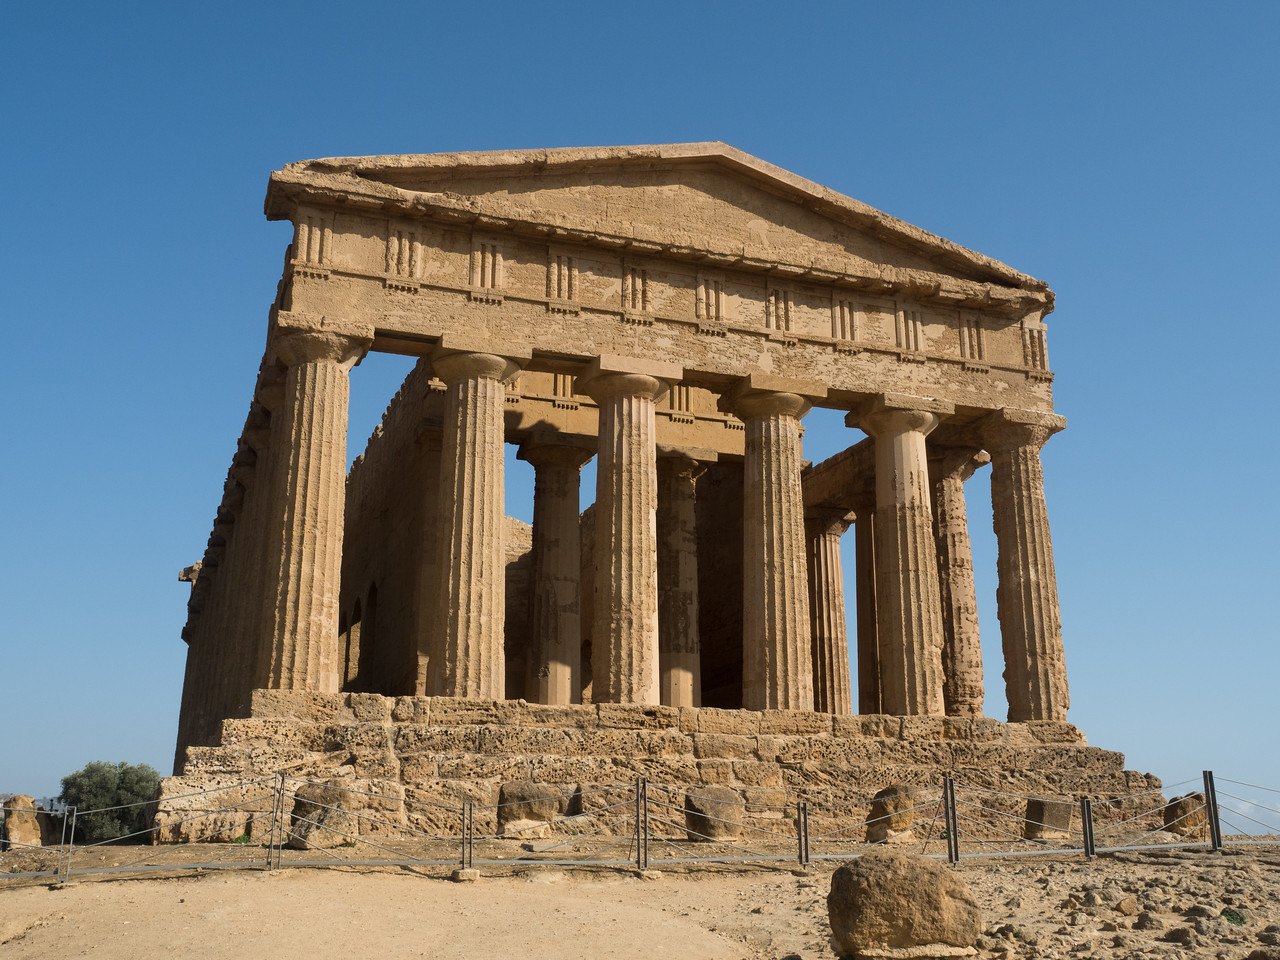 Temple of Concordia (430 BCE)